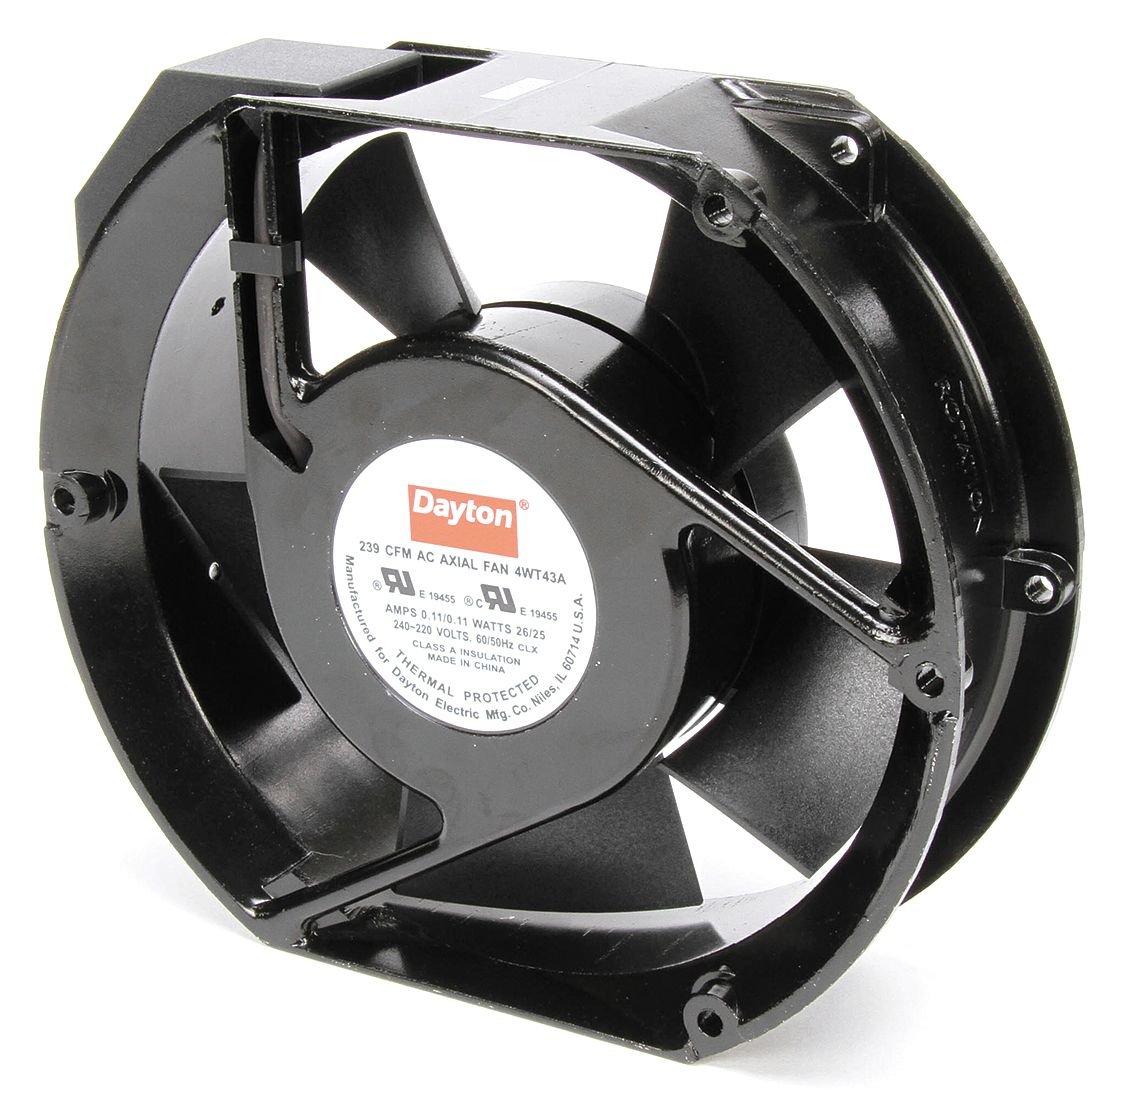 Dayton 4WT43 Fan, Axial, 238 CFM, 230v